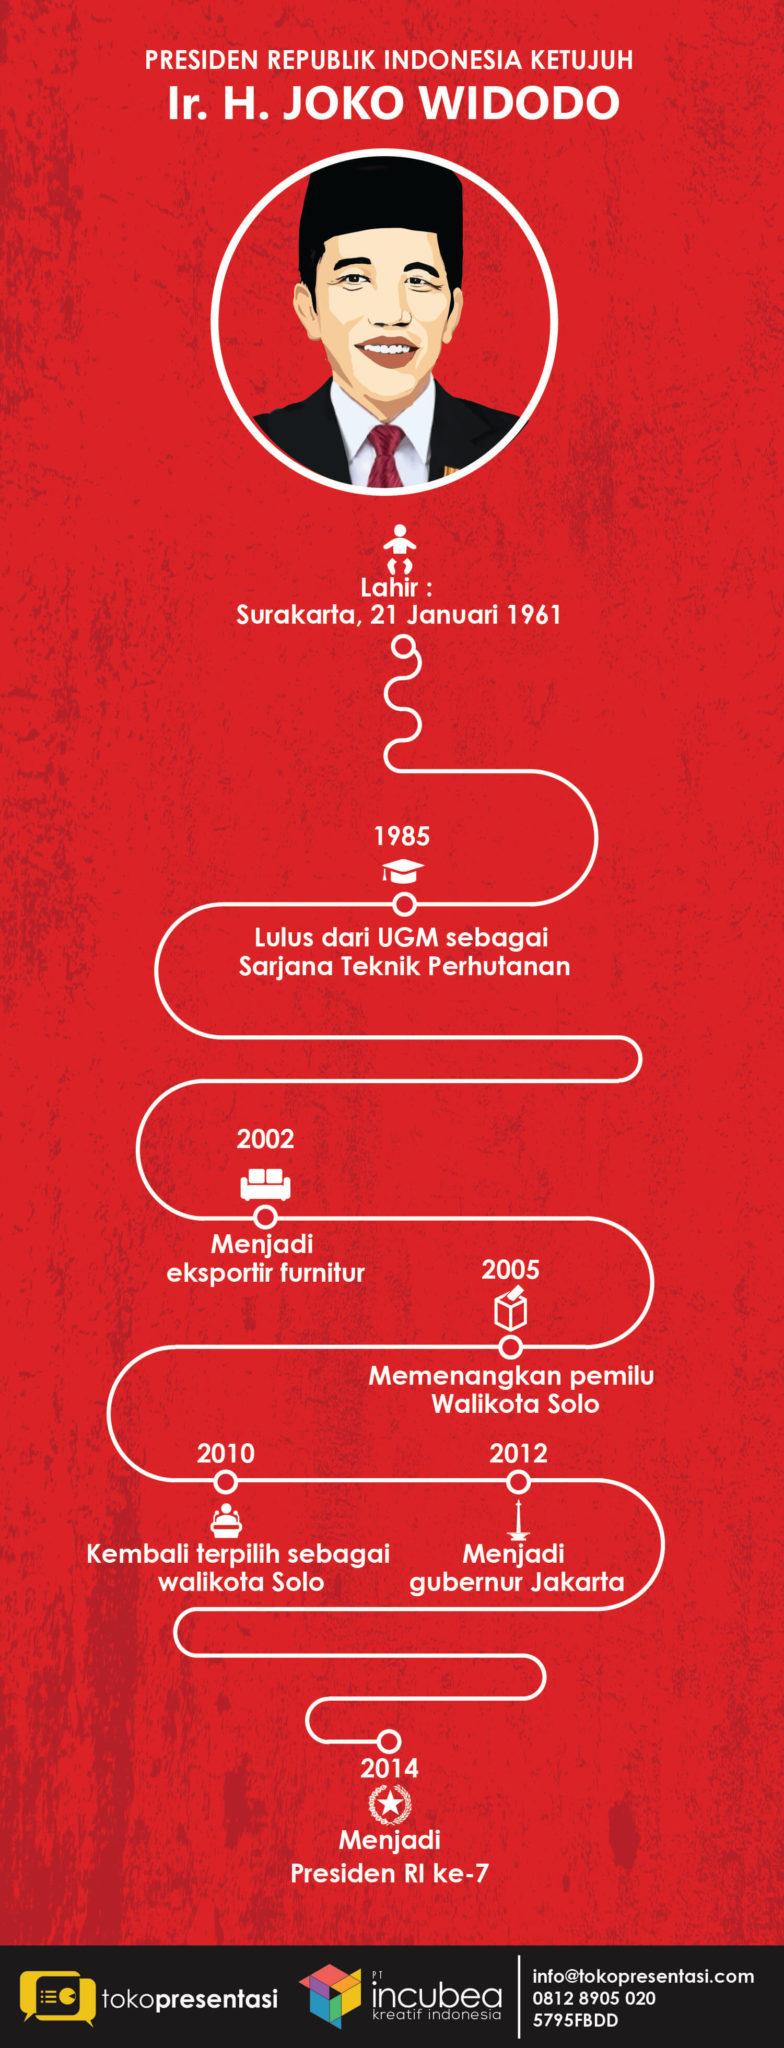 Infografis Presiden RI ketujuh Ir.H Joko Widodo jasa infografis tokopresentasi-04